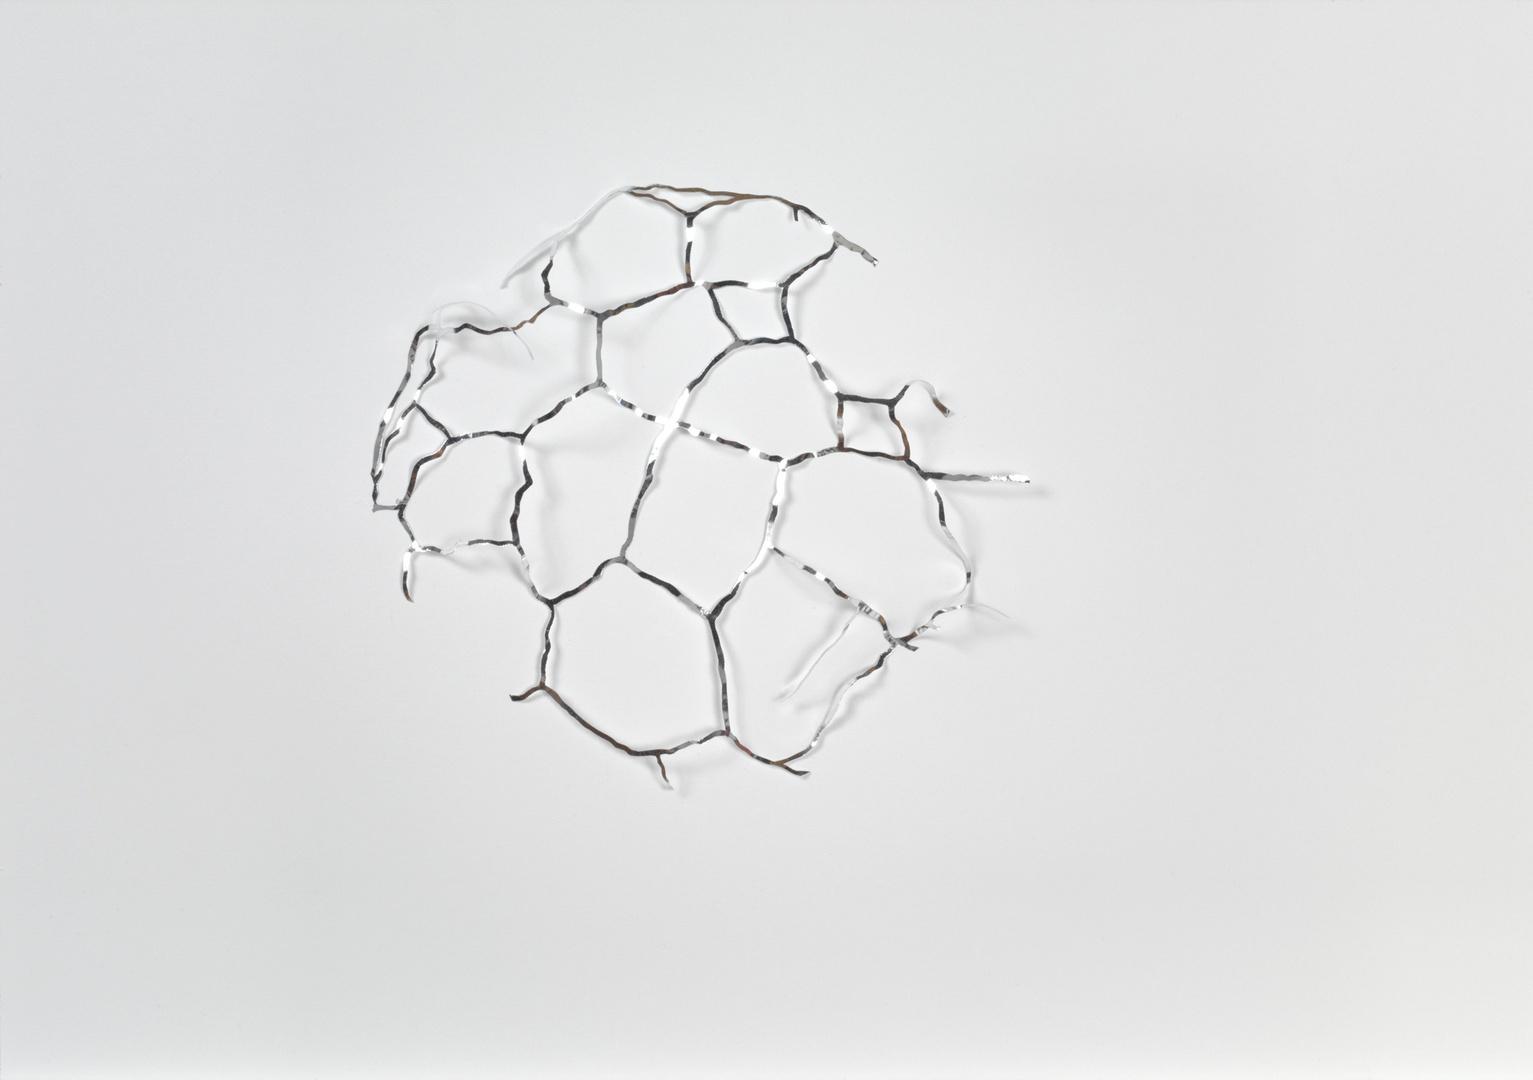 Voronoi drawings